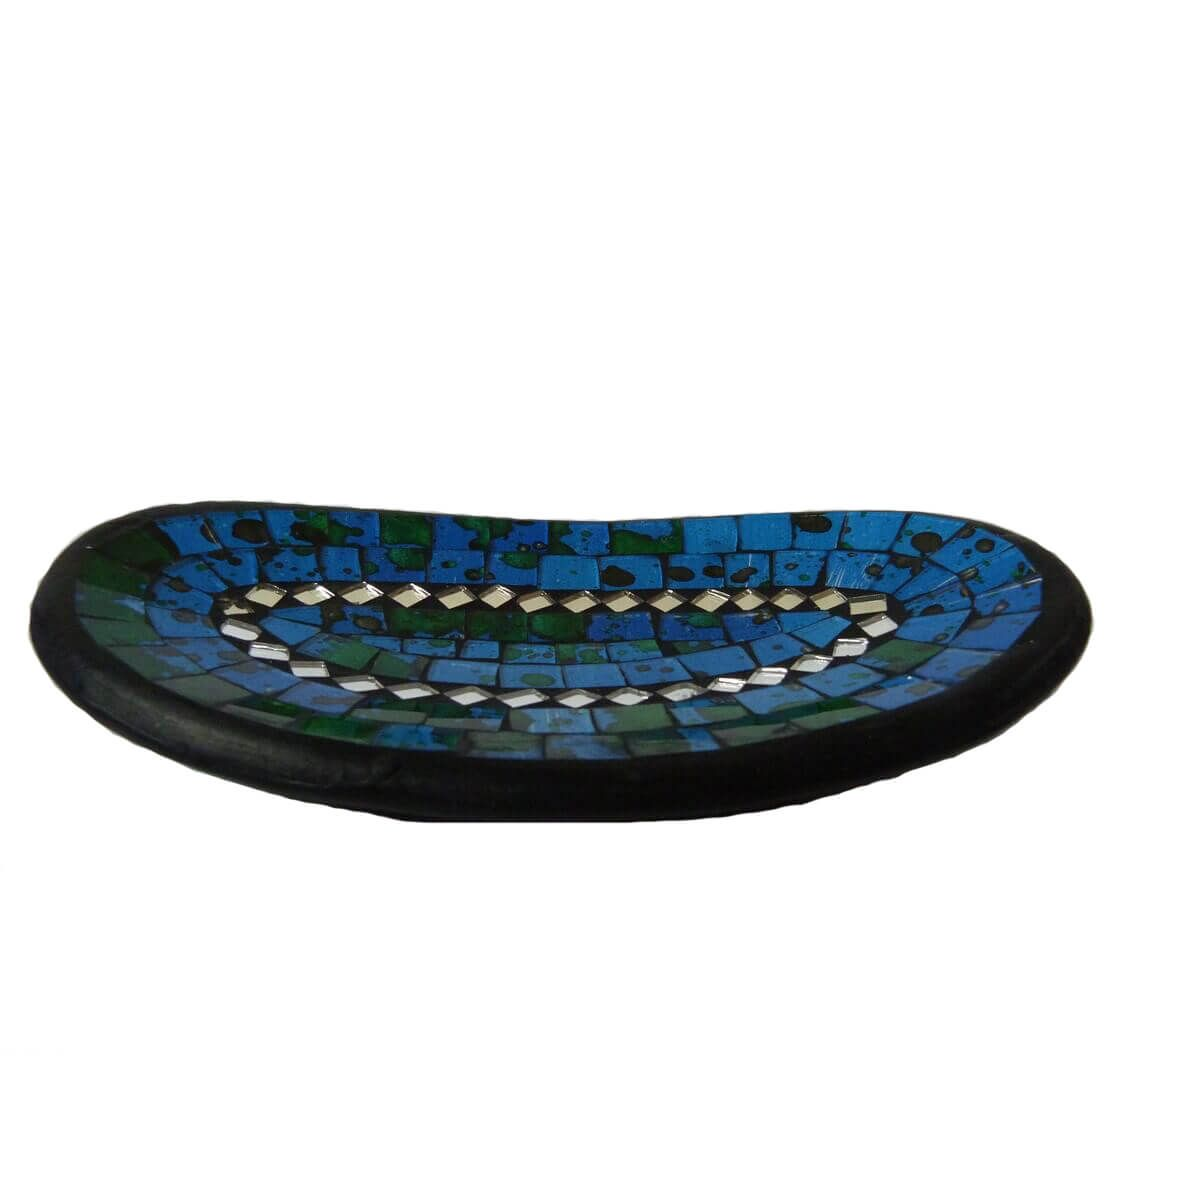 Mosaikschale tonschale glasschale dekoschale mosaik deko oval spiegel mittel ebay - Spiegel mosaik deko ...